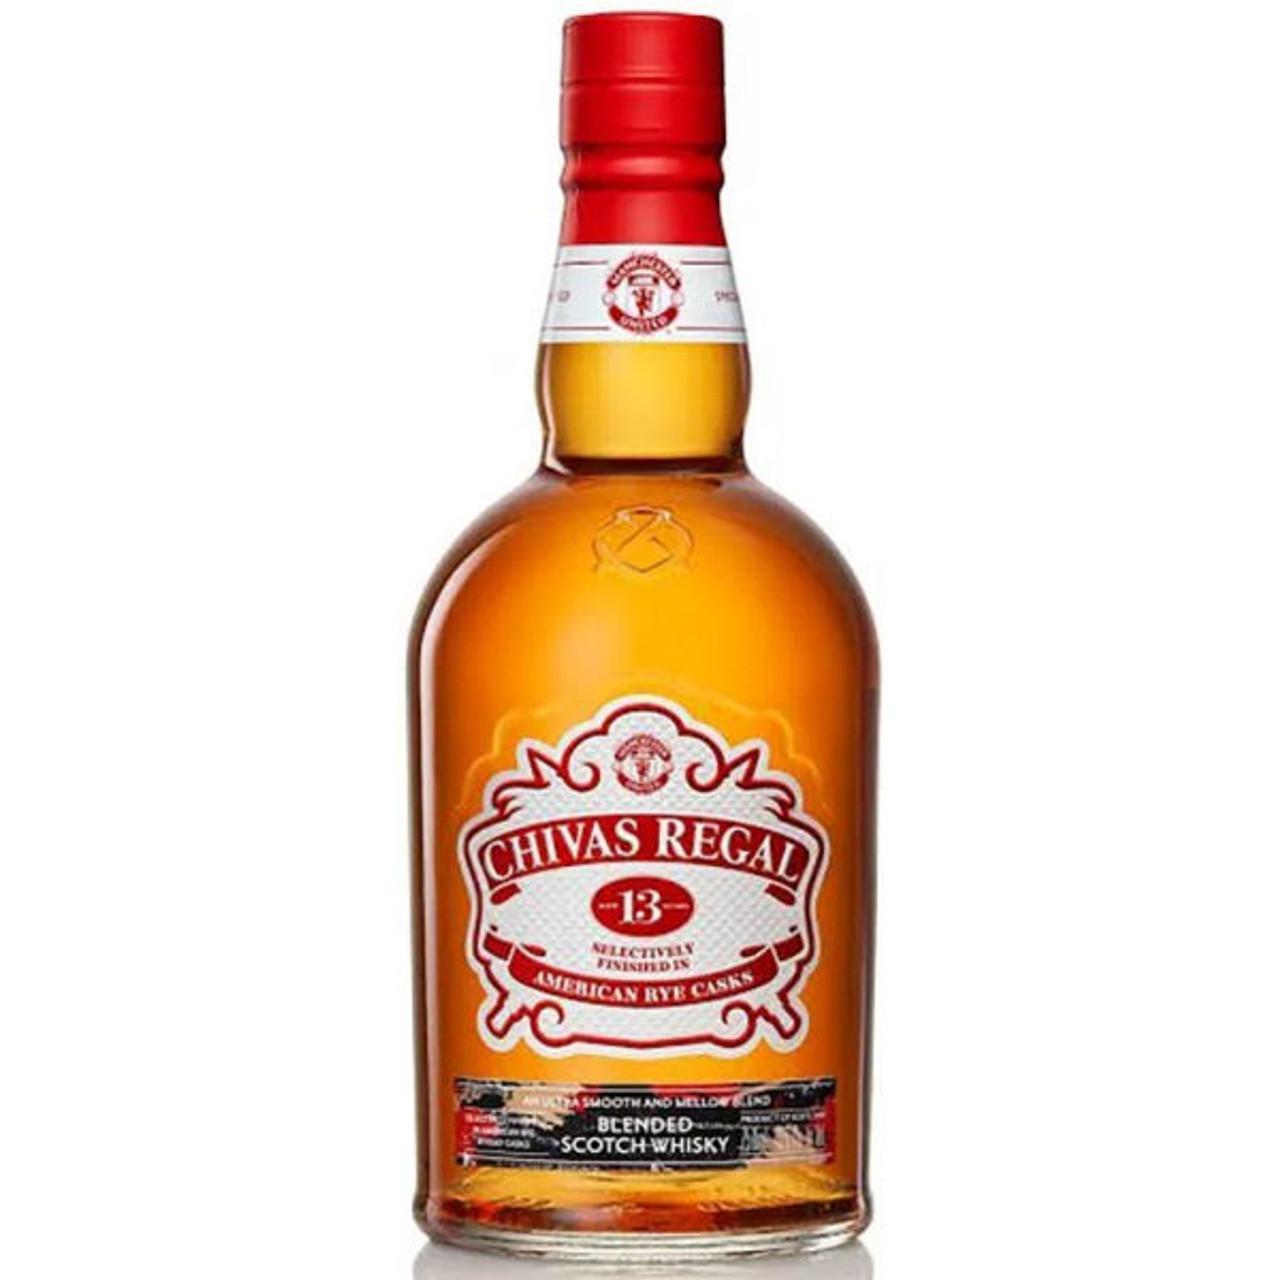 Chivas Regal 13 Year Old Blended Scotch 750ml